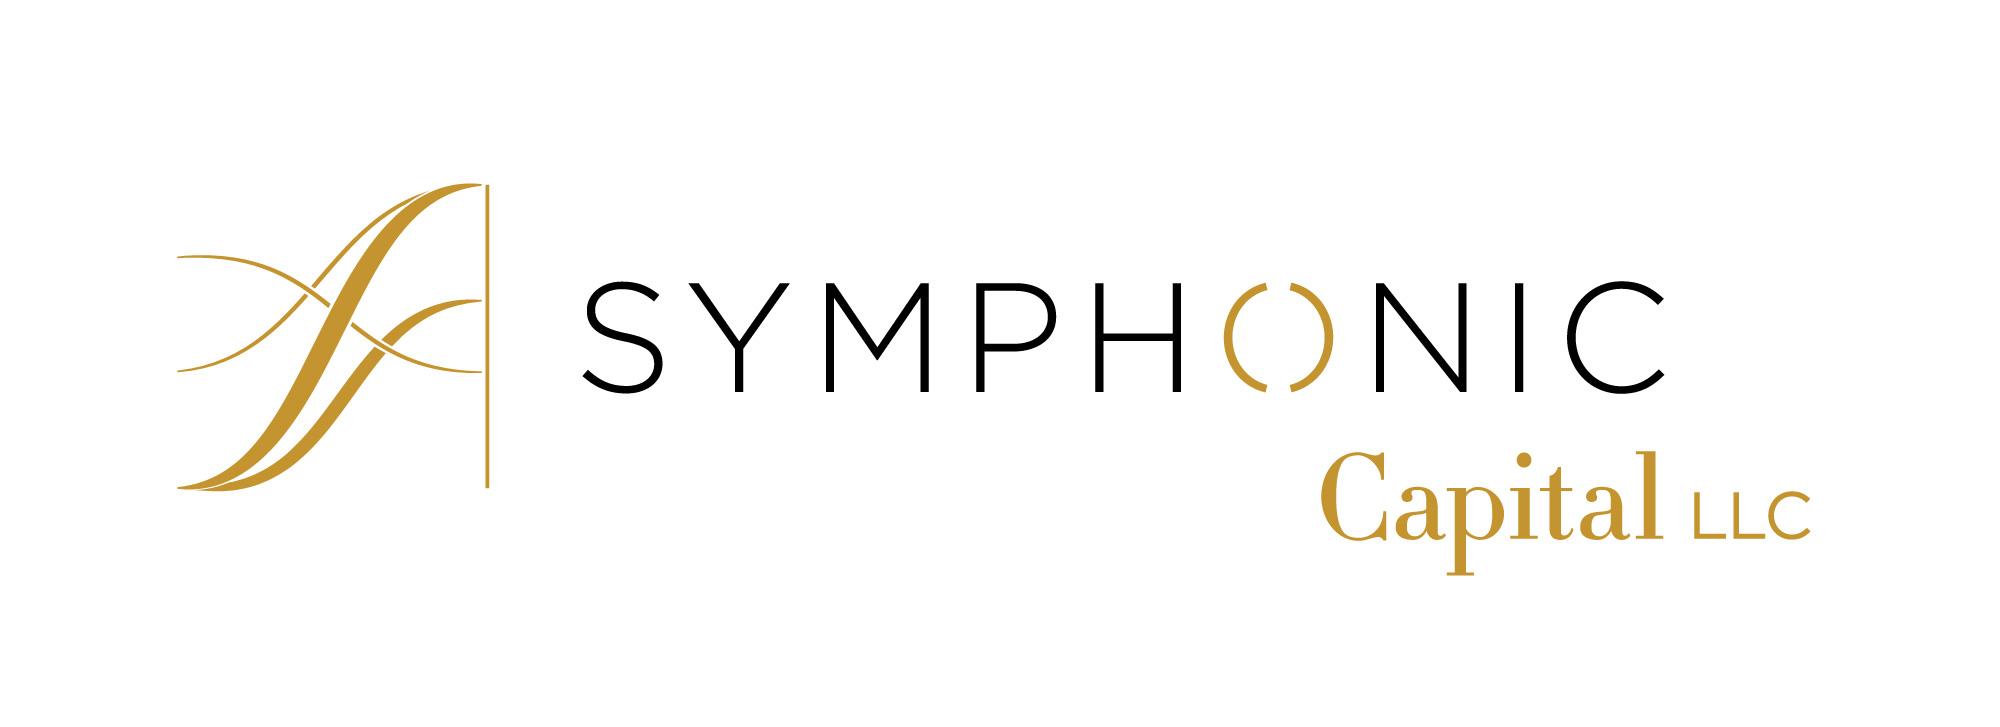 Symphonic Capital Logo Woven